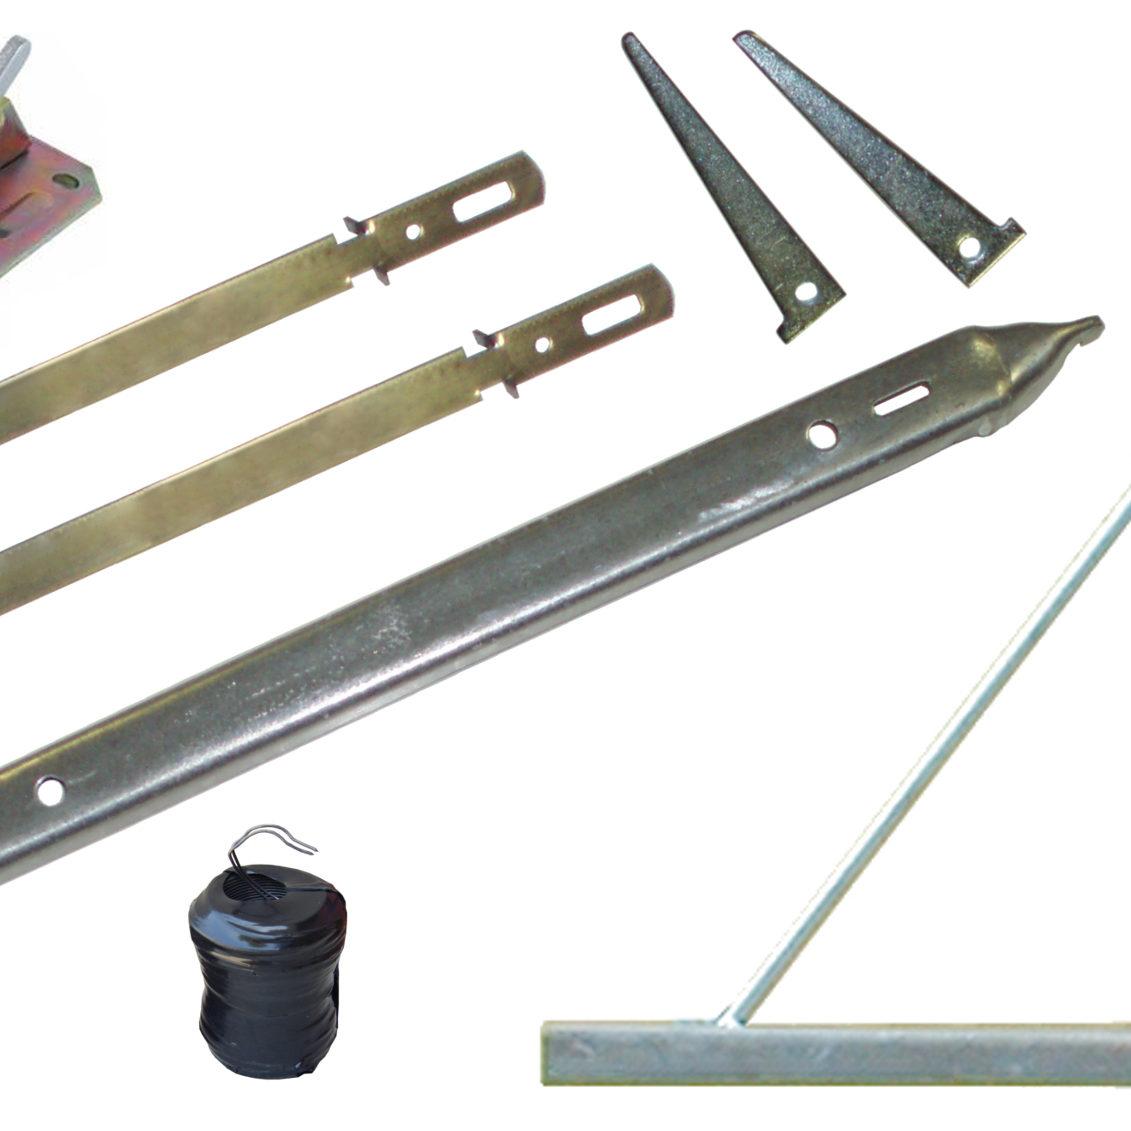 Metal accessories